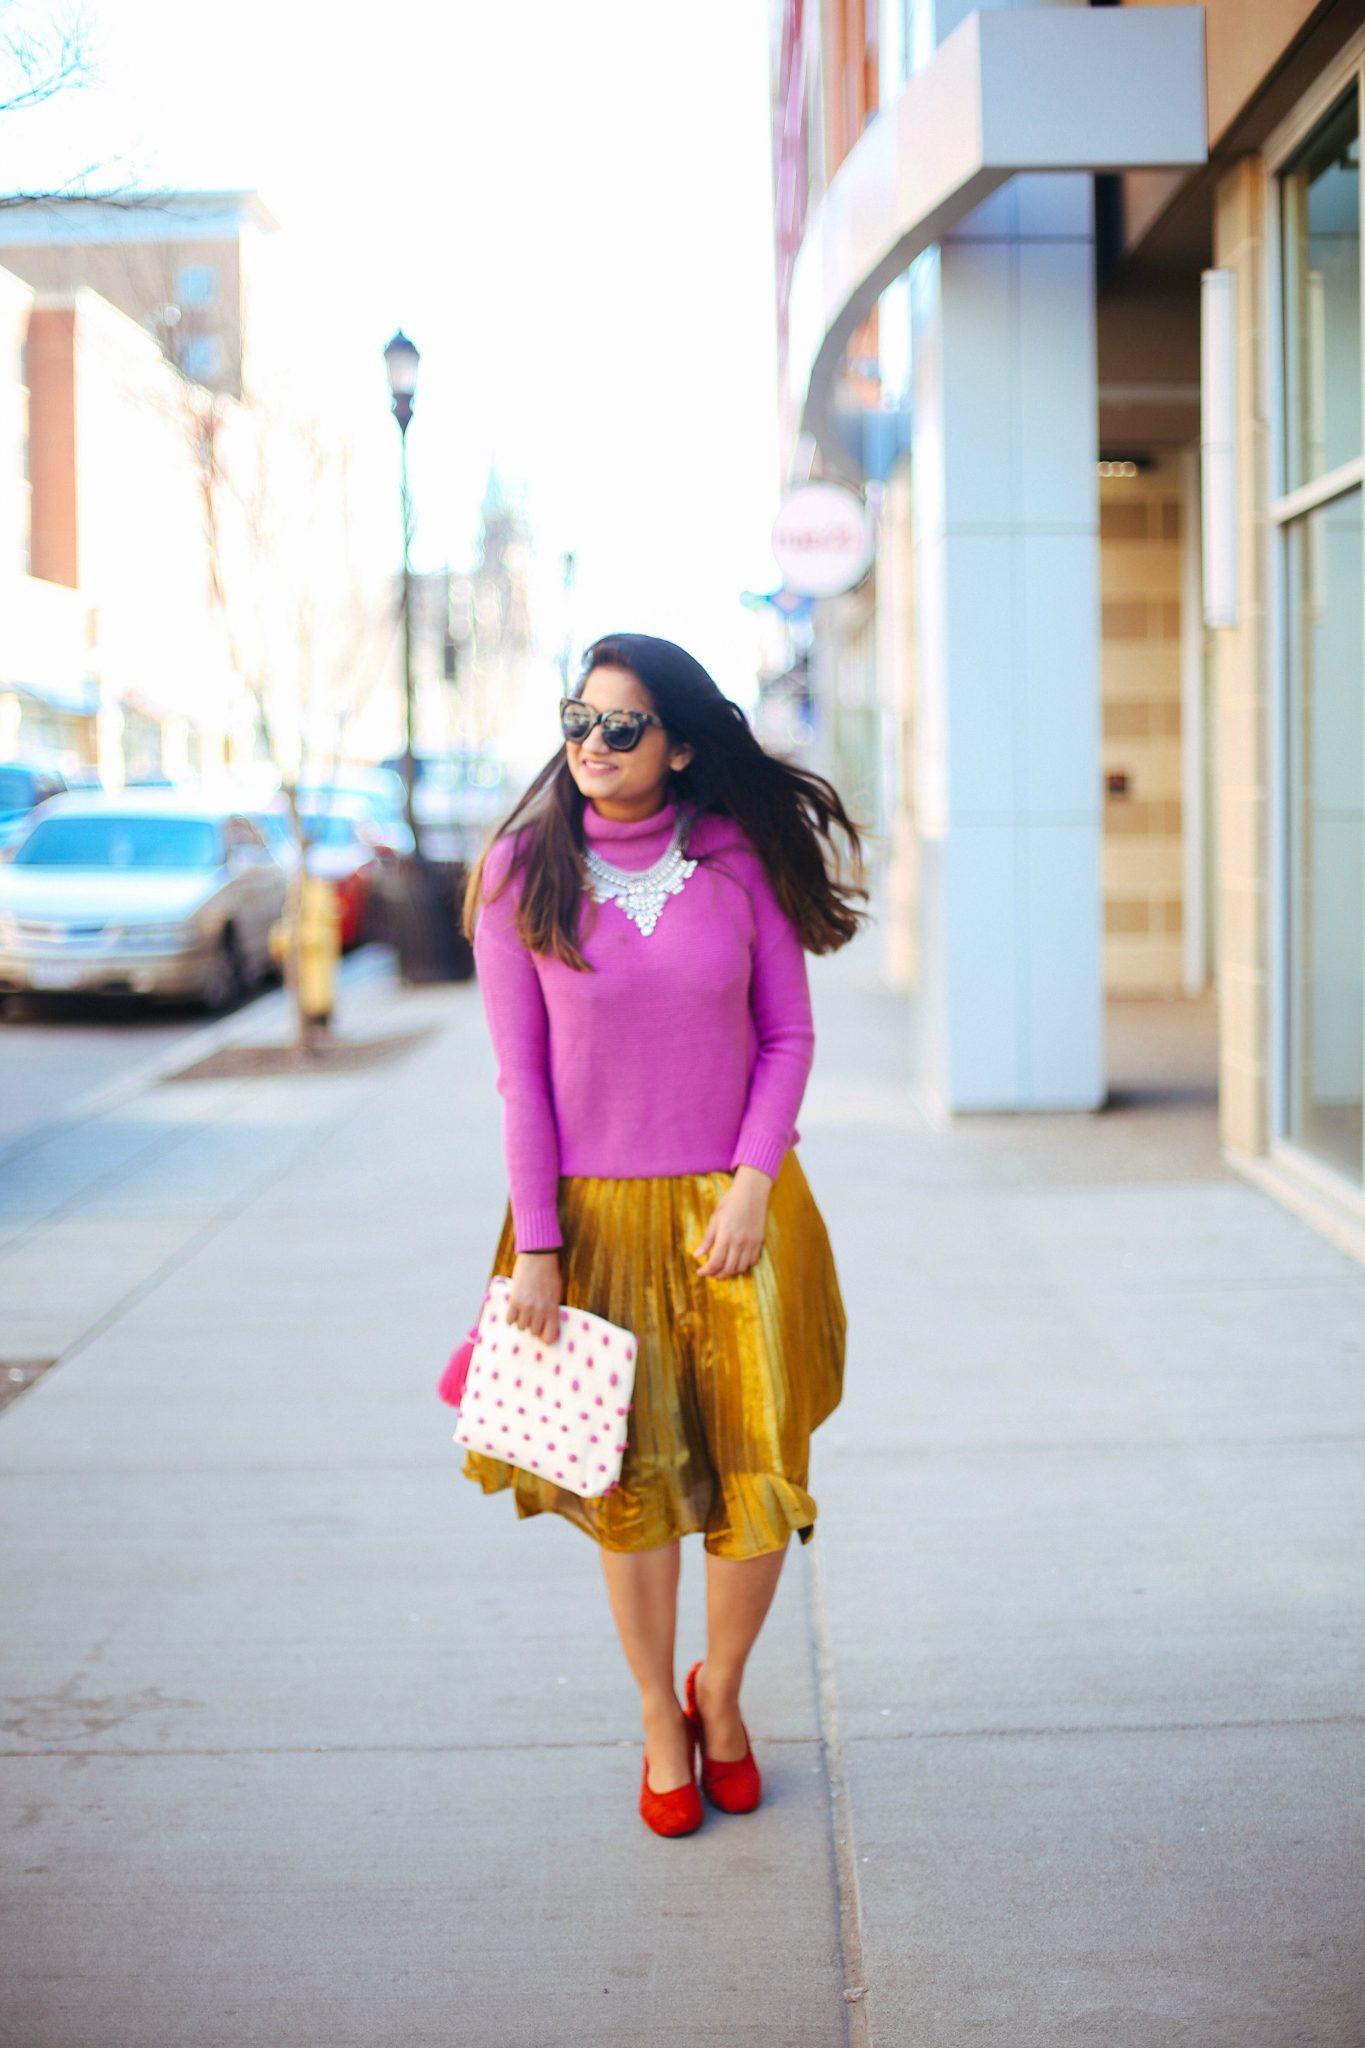 Quay-Australia-KITTI-FASHION-SUNGLASSES-How to dress up gold pleated midi skirt - SheIn Gold Pleated Midi Skirt styled by popular Ohio modest fashion blogger, Dreaming Loud